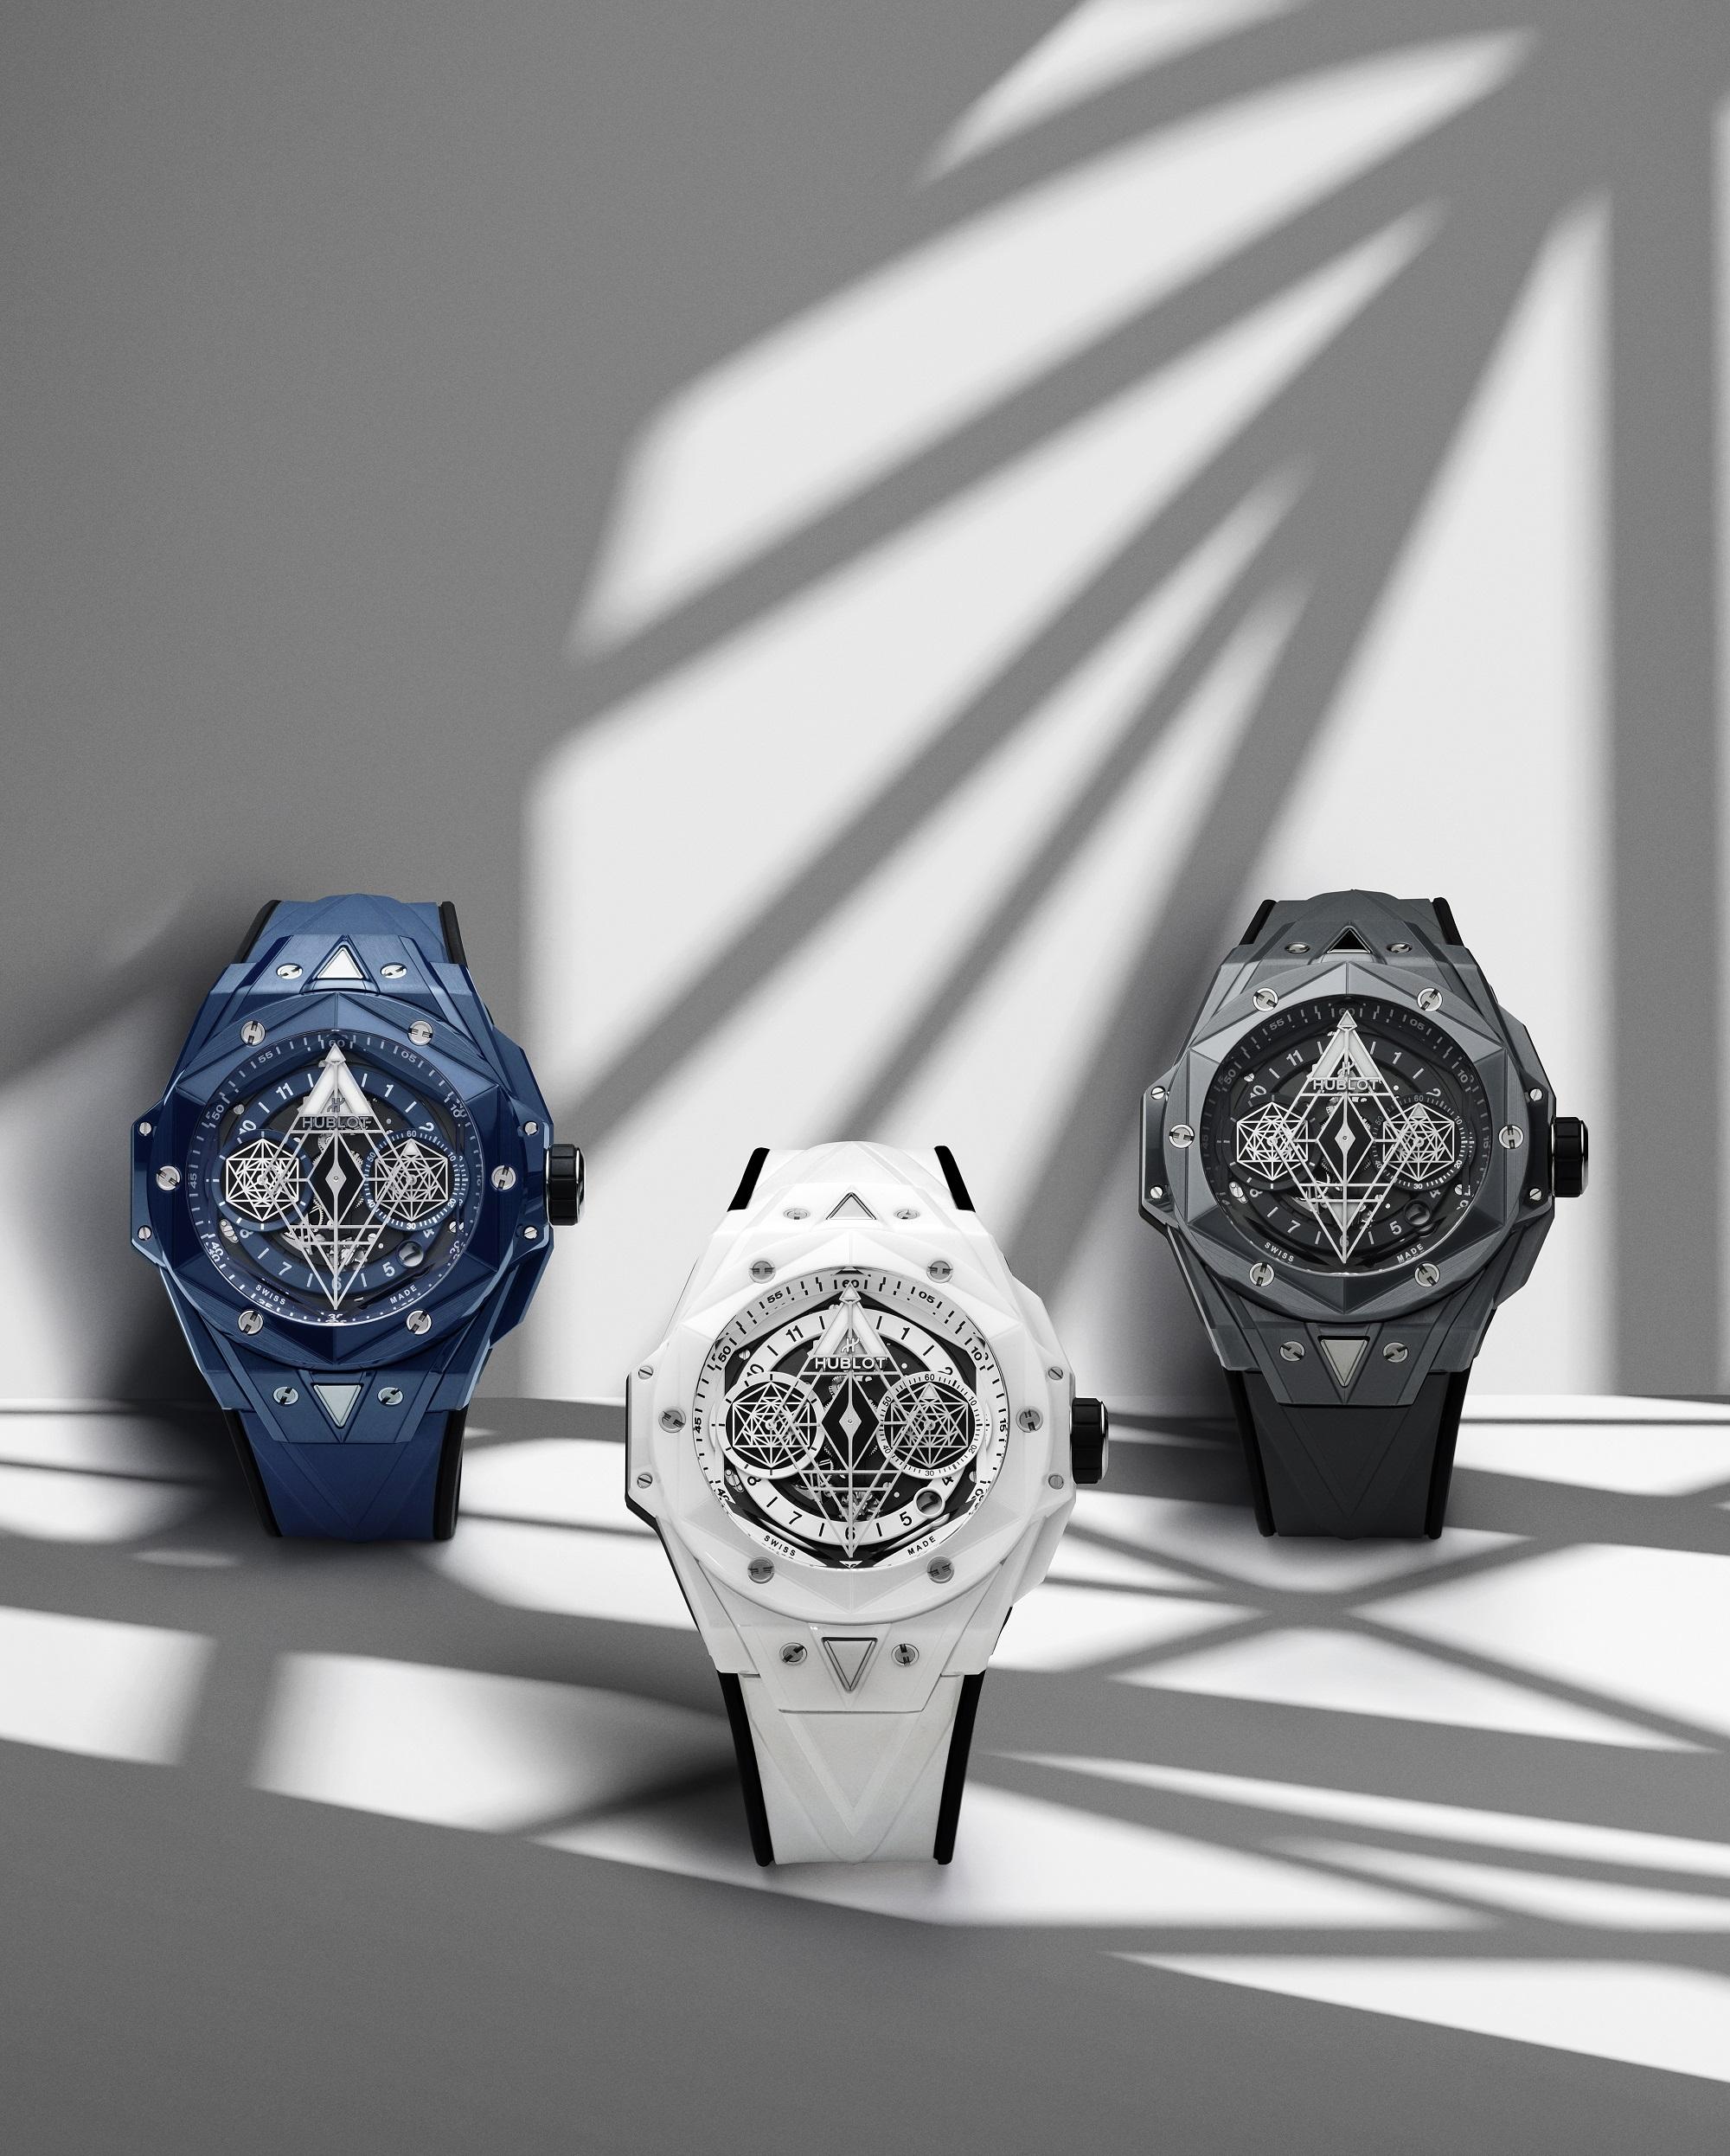 Hublot Big Bang Sang Bleu II Ceramic watches